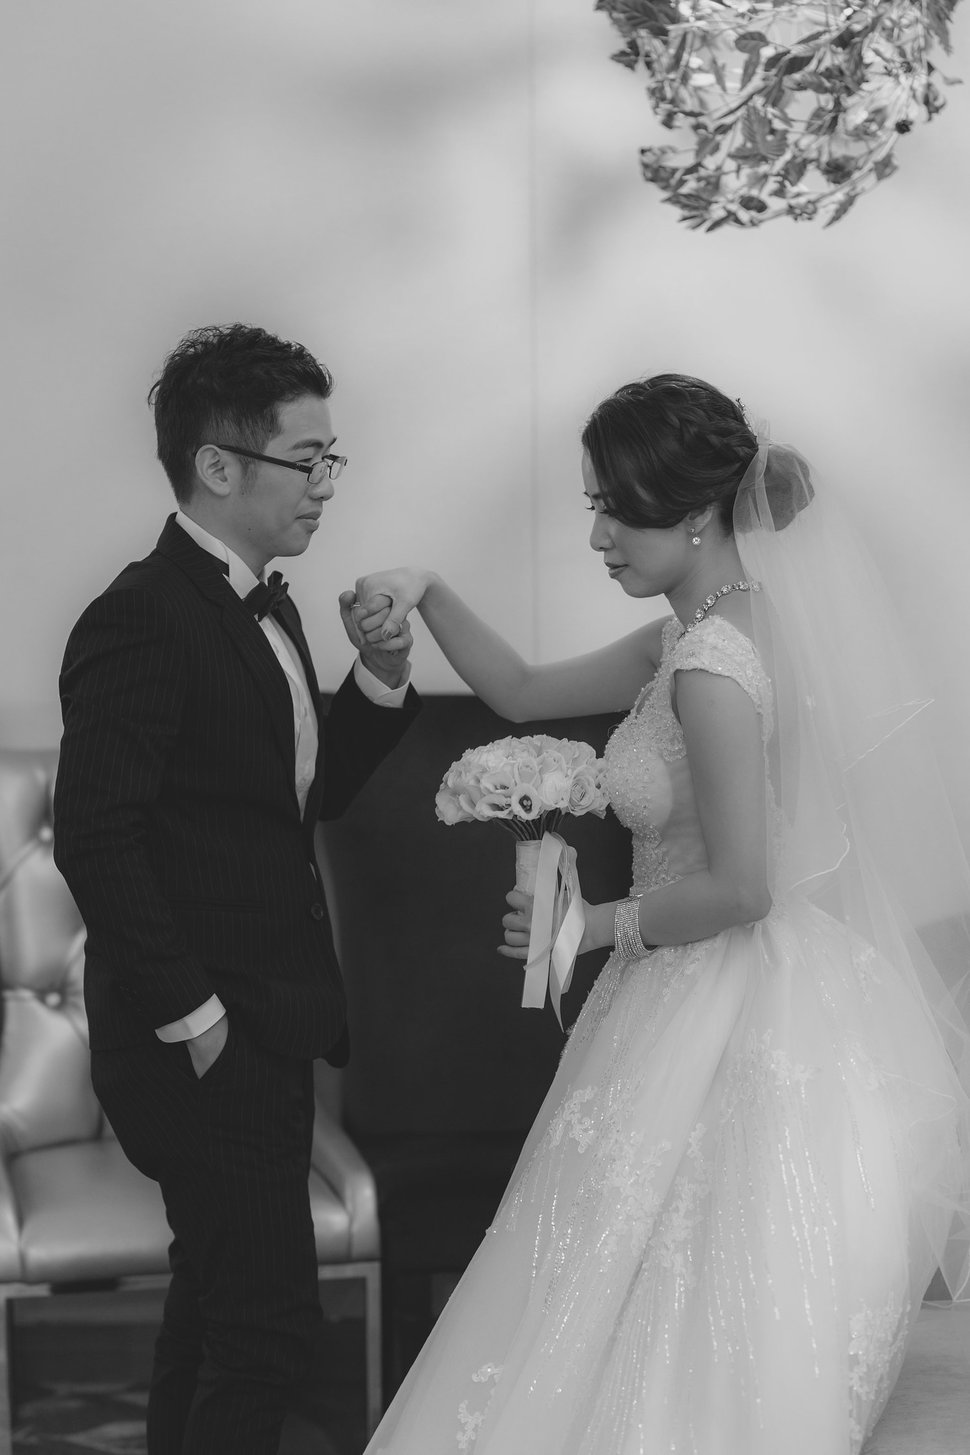 48343569726_d46b6c1640_k - J Photographer《結婚吧》